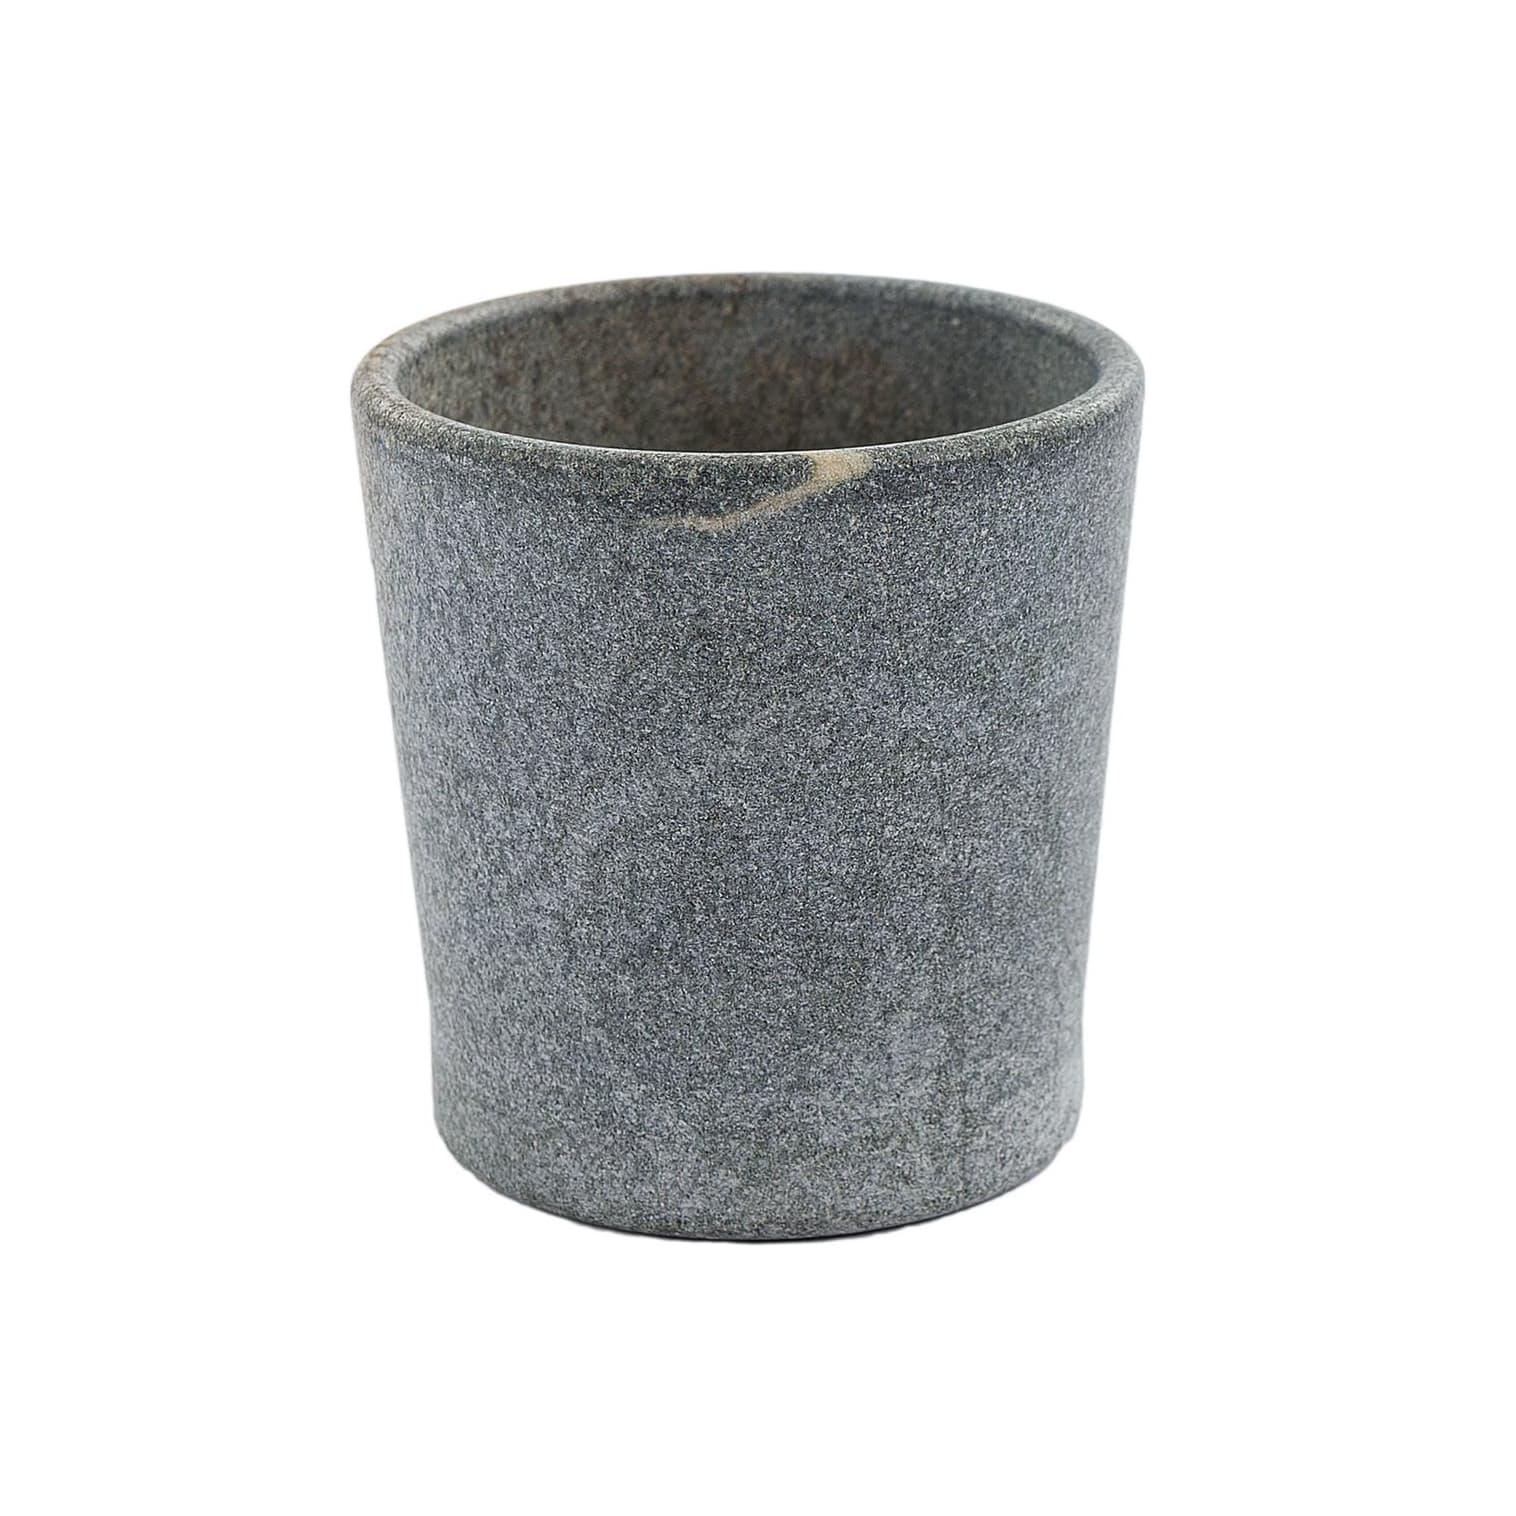 Oypwea7a0d american stoneware soapstone whiskey glass 0 original